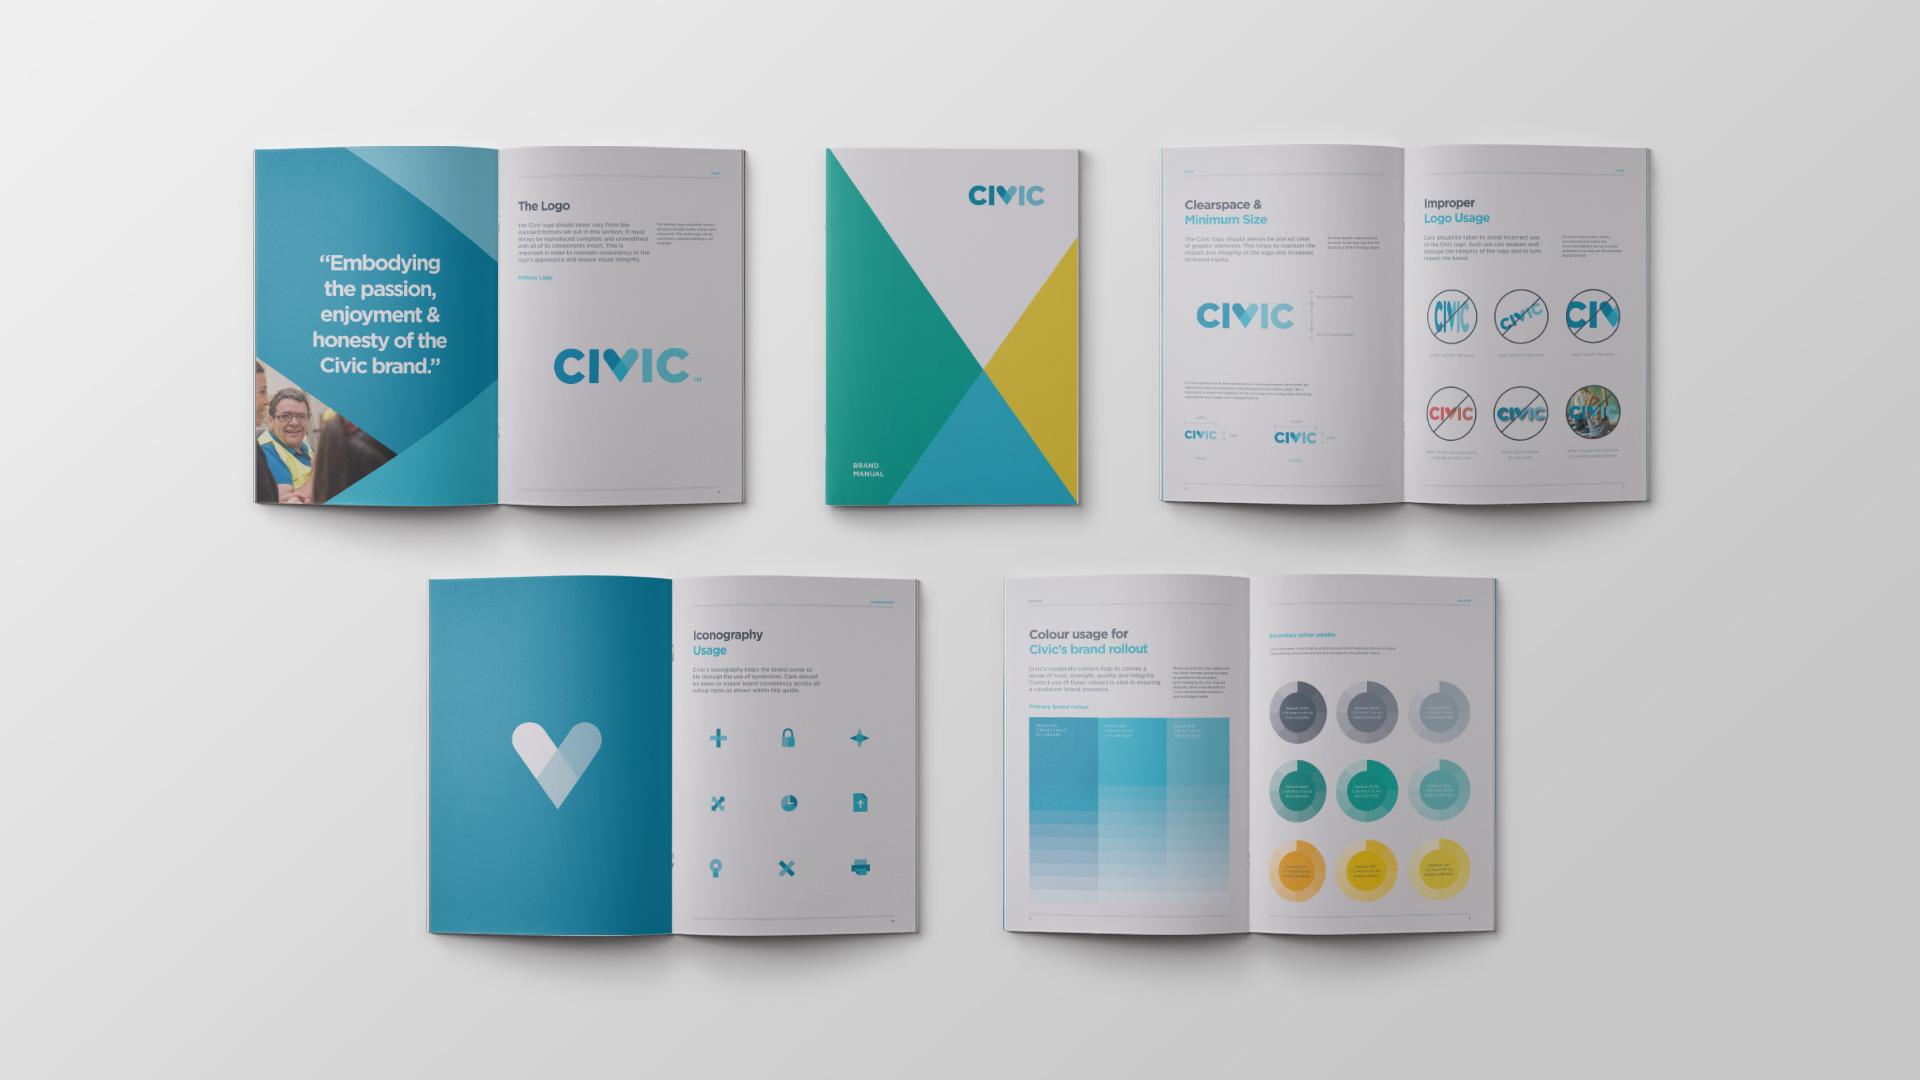 Civic_brand_manual 2.jpg